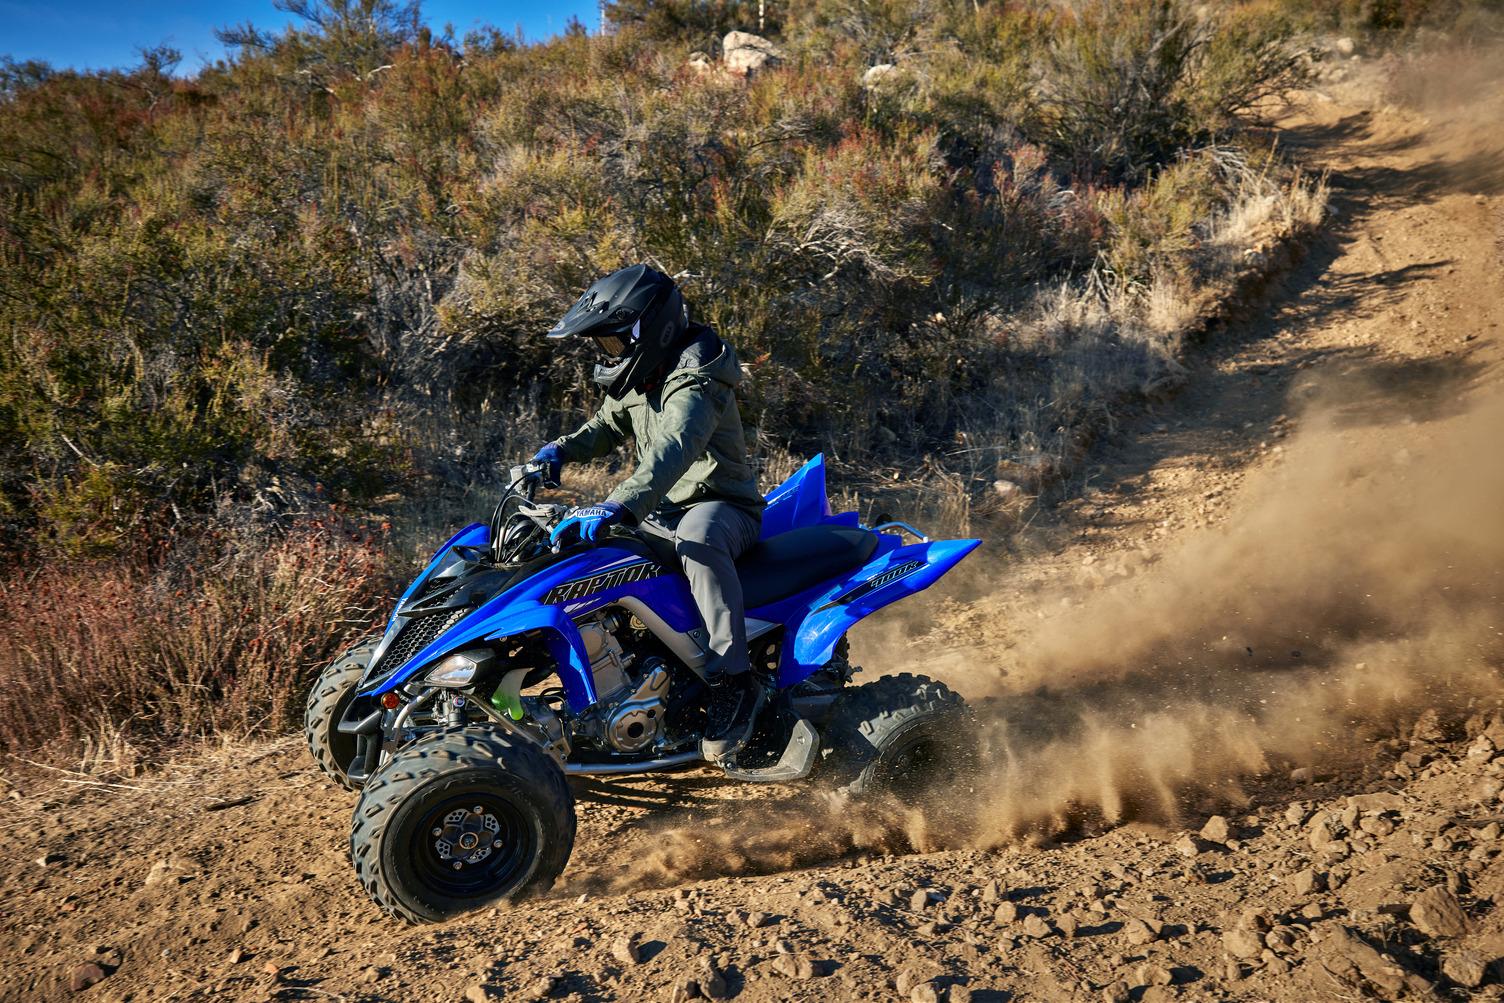 2021 Yamaha Raptor 700R